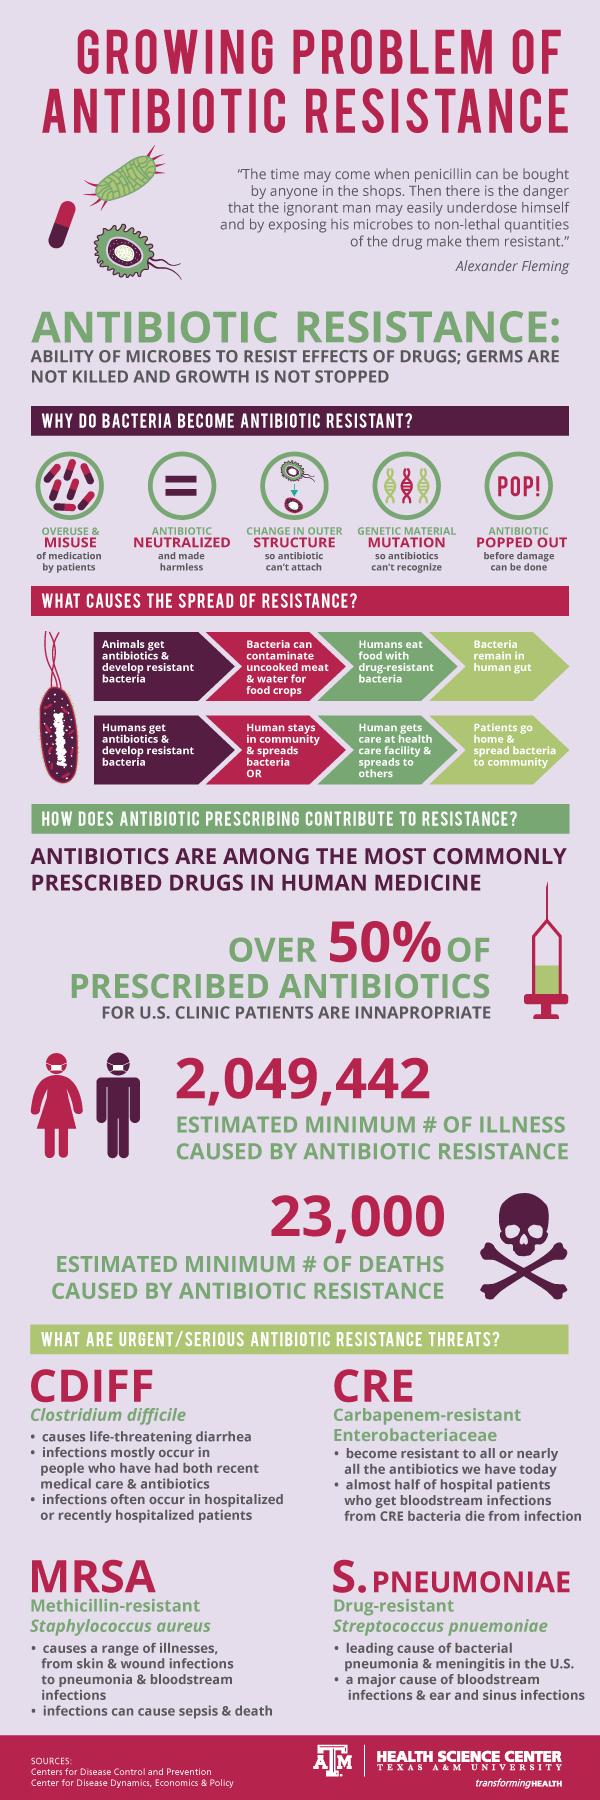 INFOGRAPHIC on Antibiotic Resistance